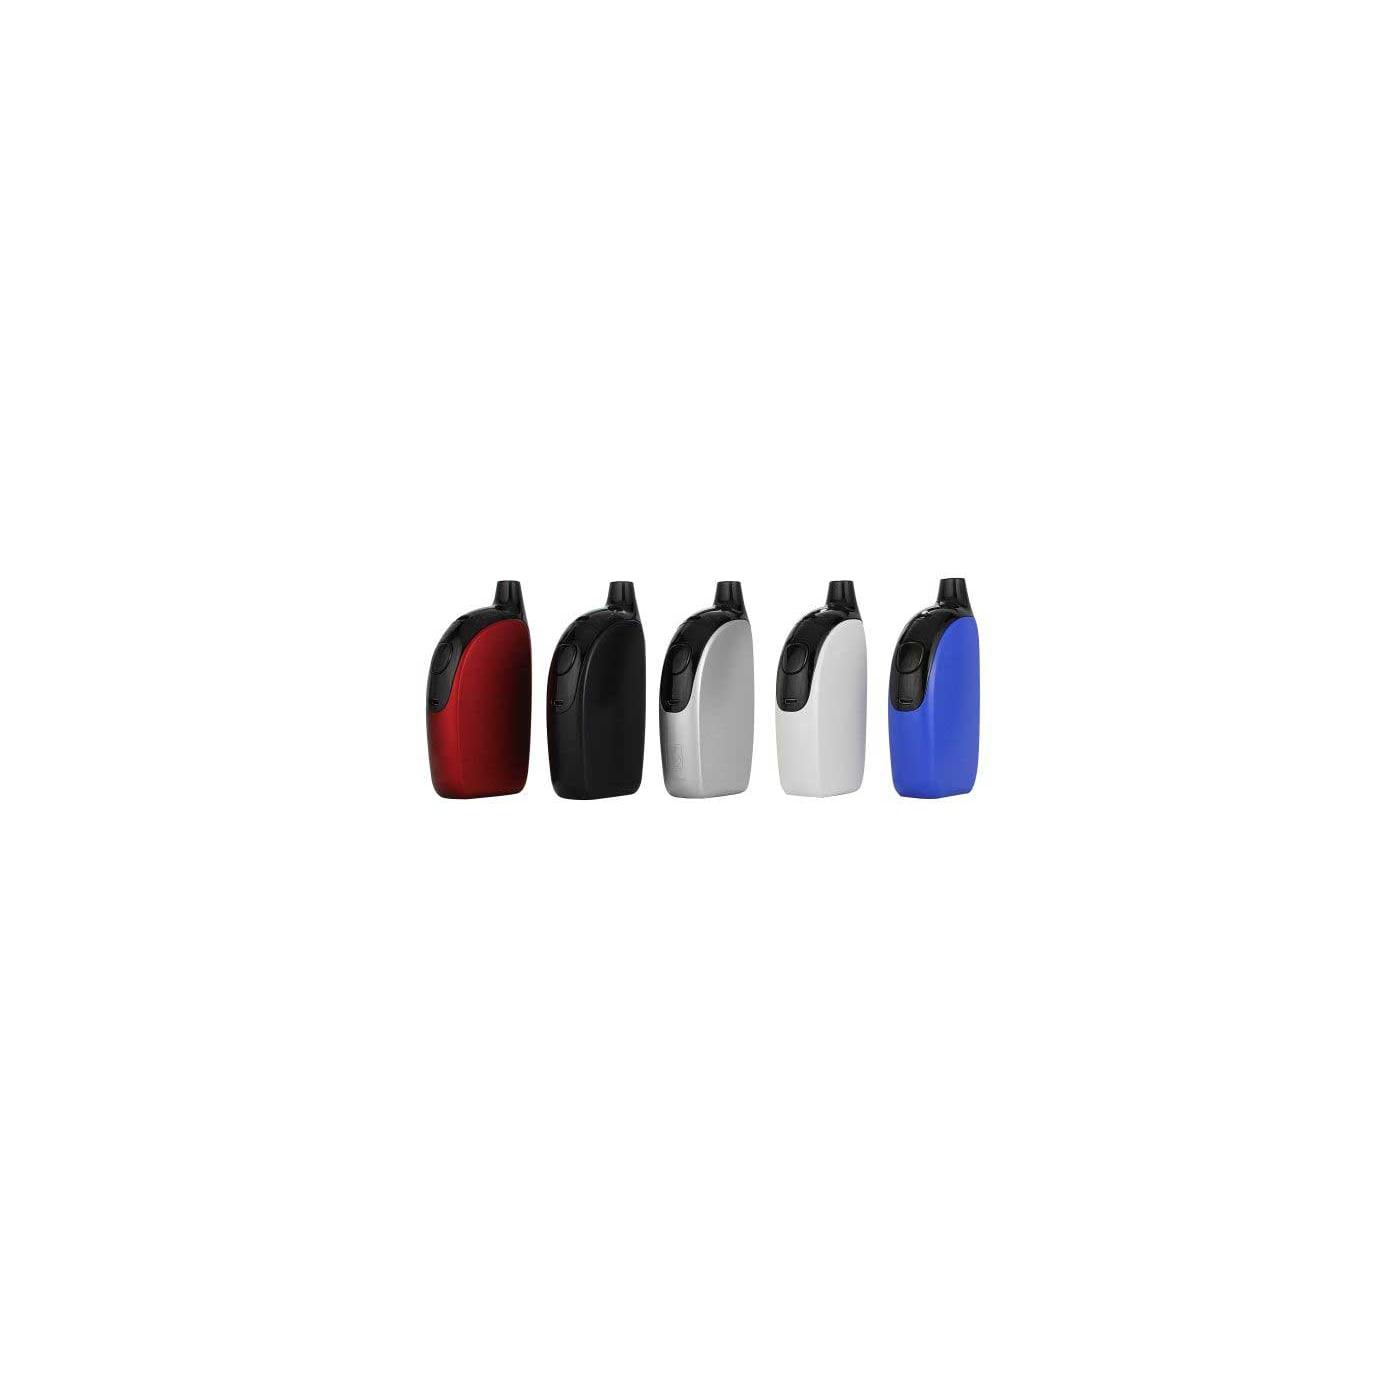 Joyetech Atopack Penguin Vape Mod Colors